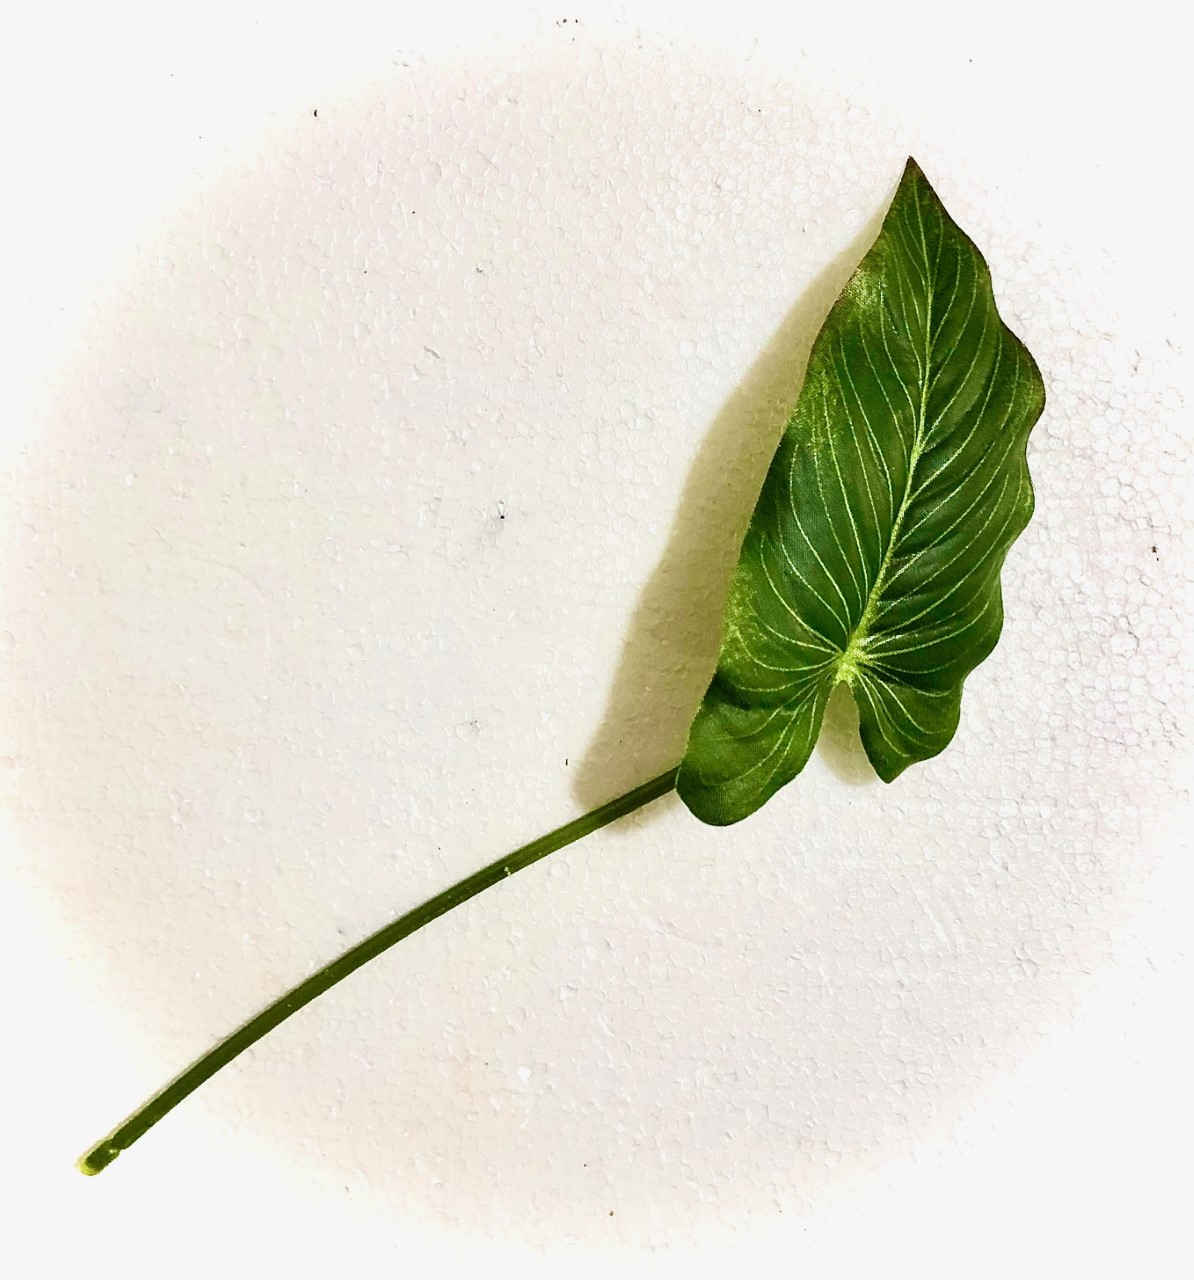 Fake 'Fresh Green' Leaf